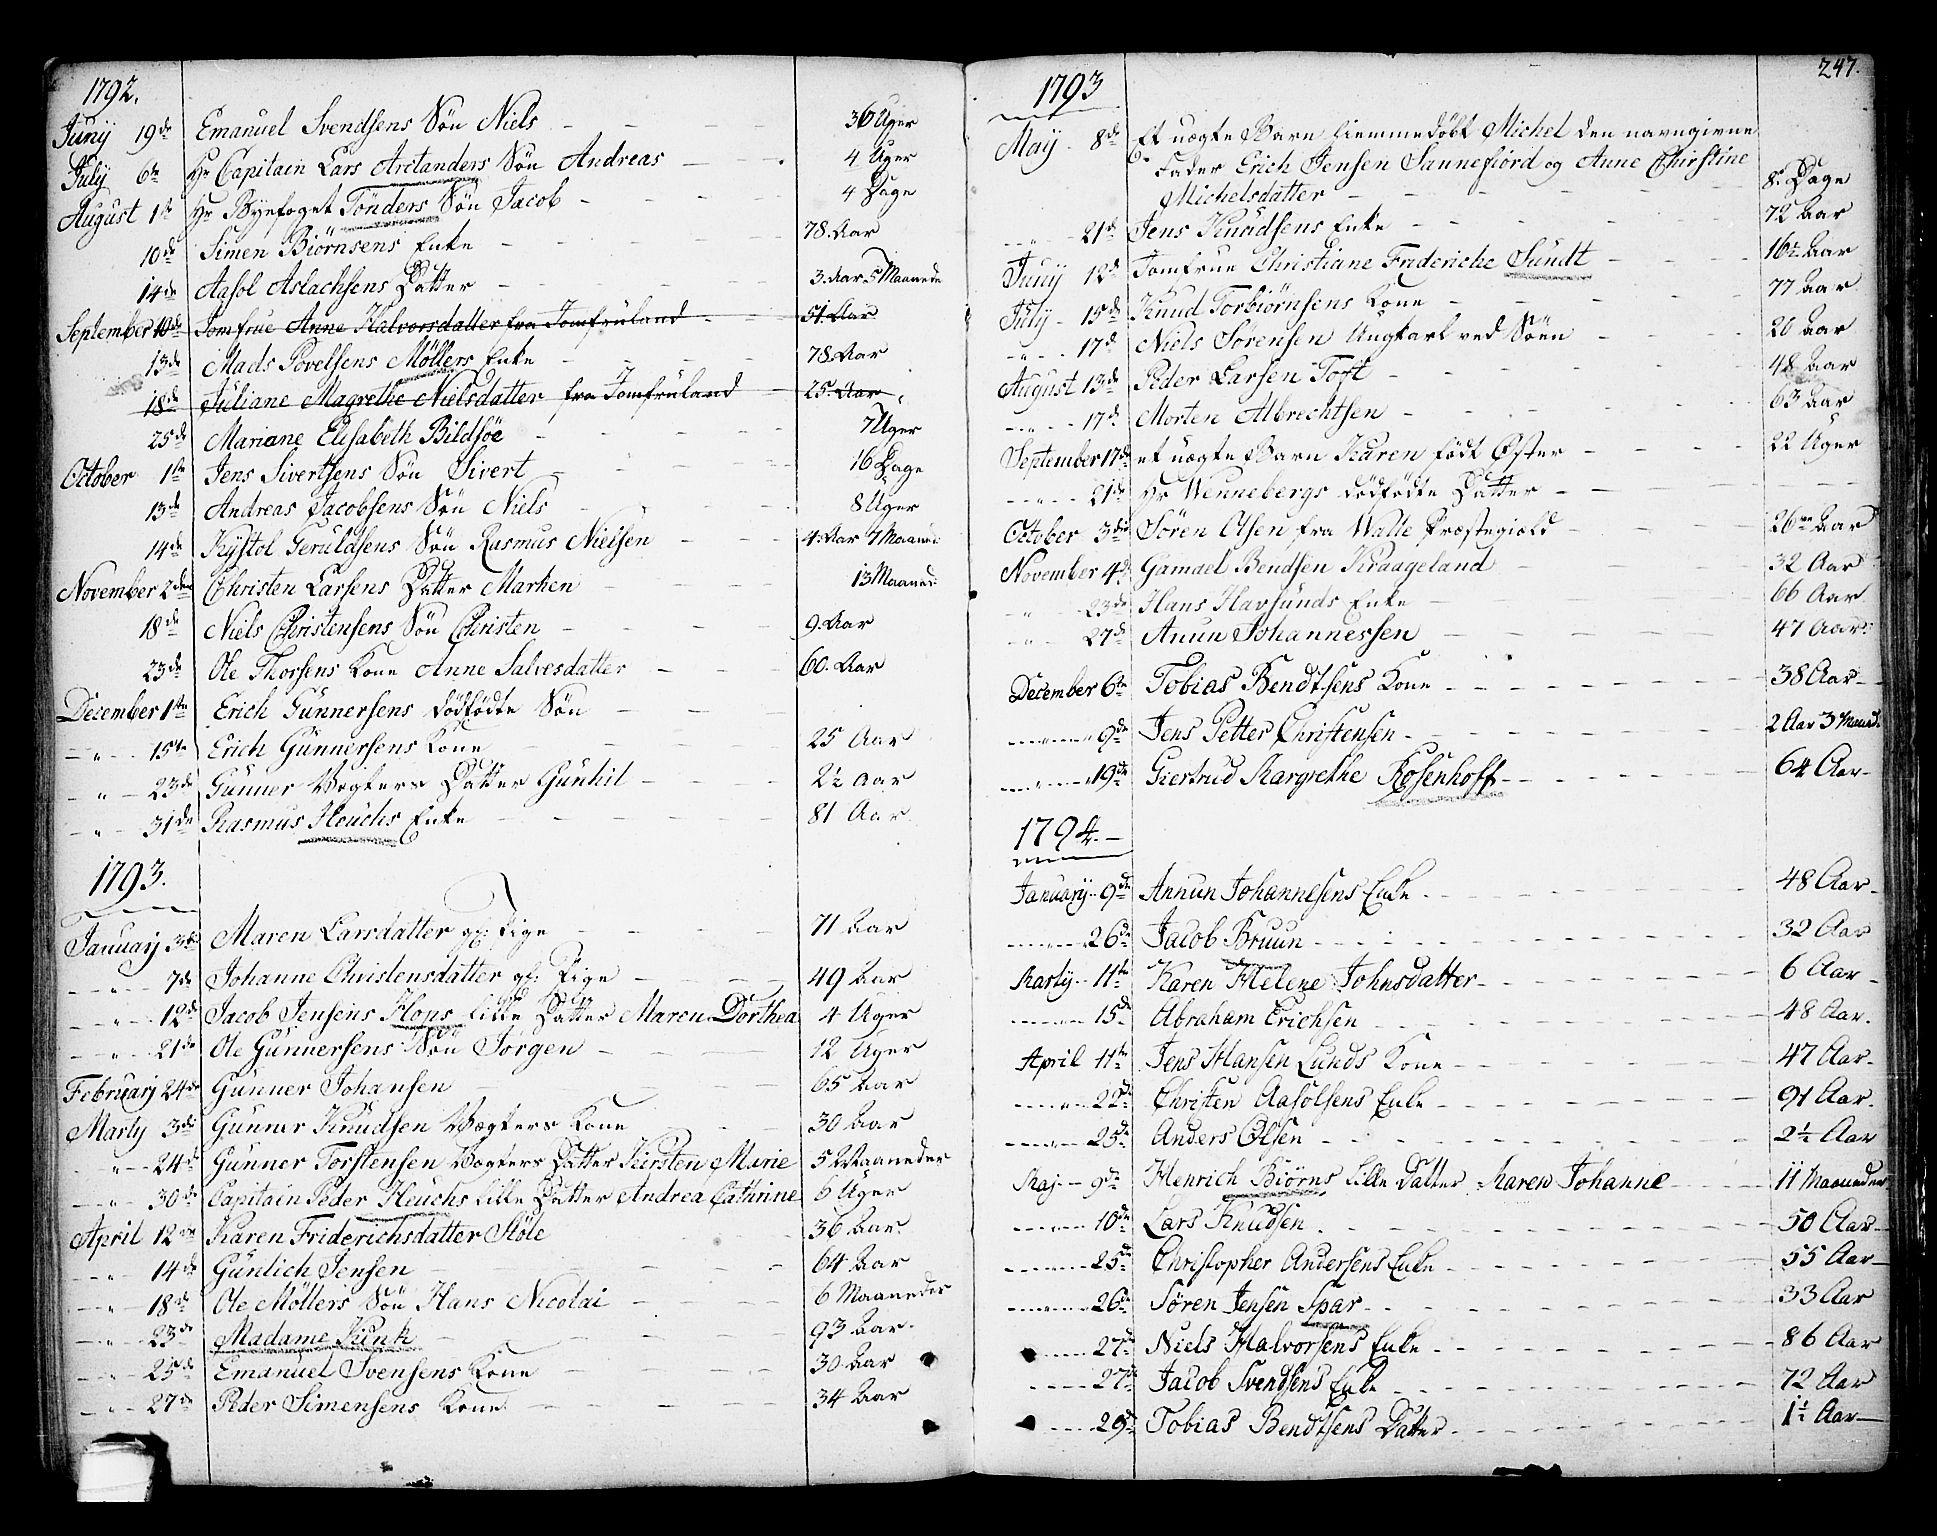 SAKO, Kragerø kirkebøker, F/Fa/L0002: Ministerialbok nr. 2, 1767-1802, s. 247